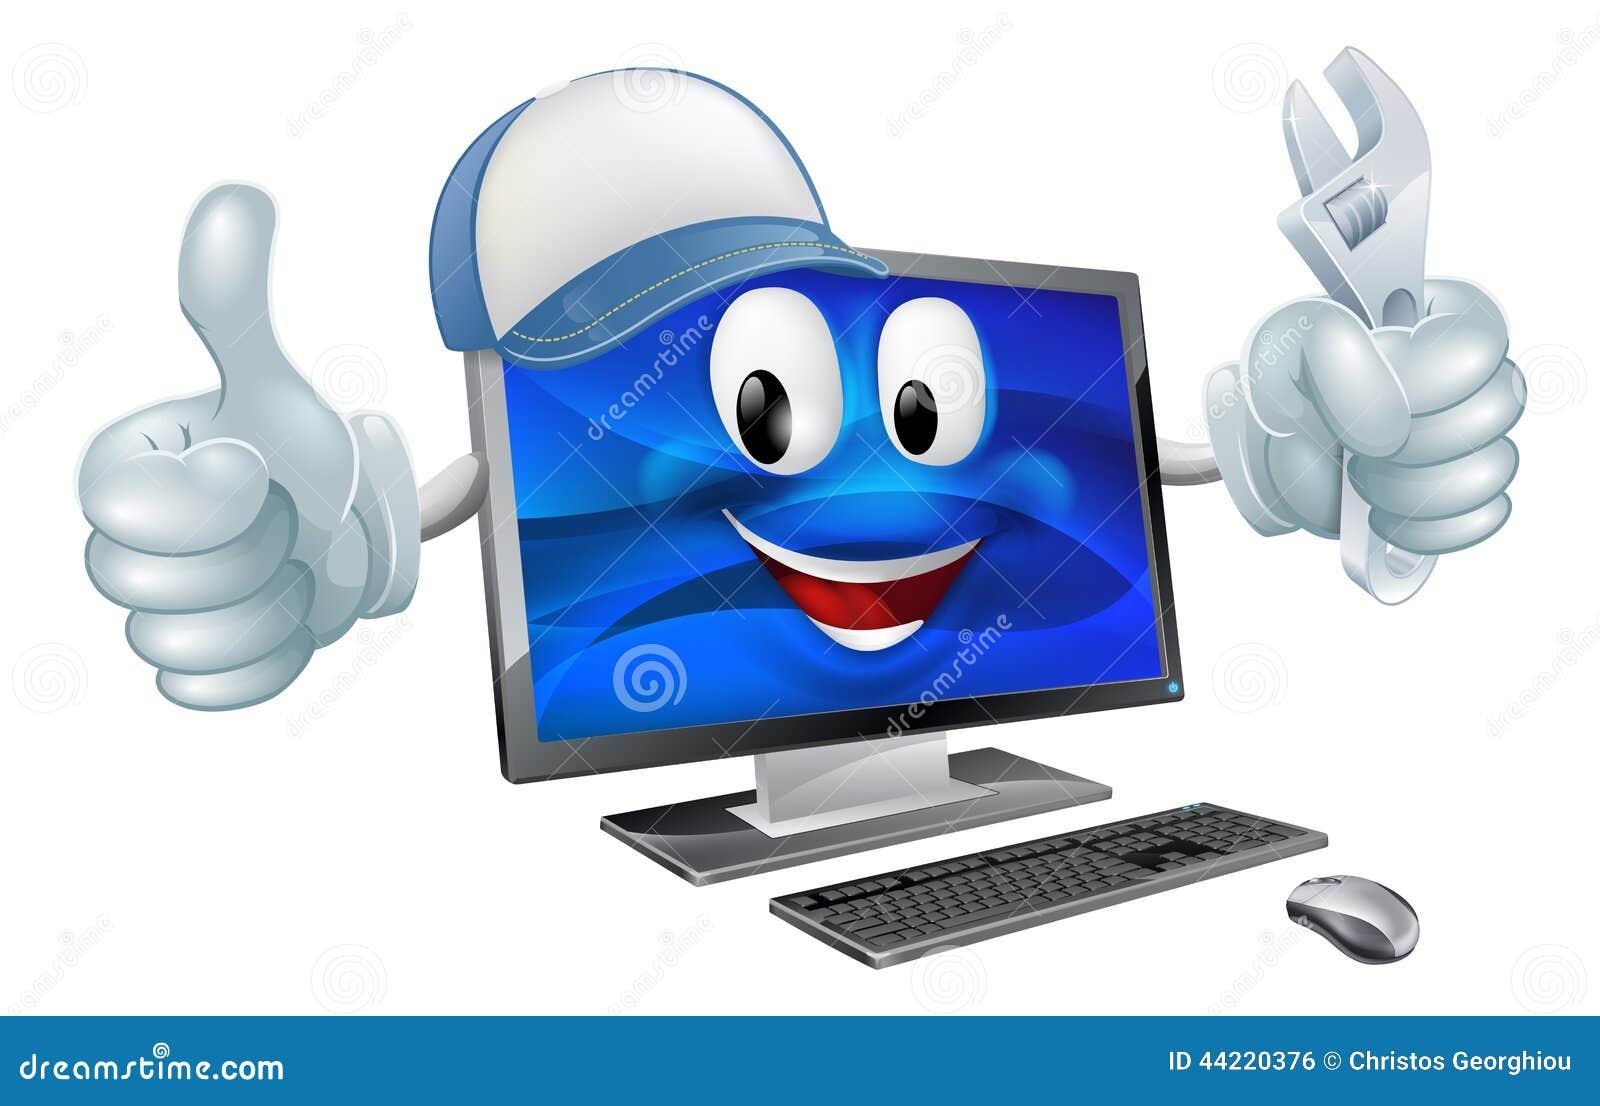 Computer Repair Cartoon Character Stock Vector Image